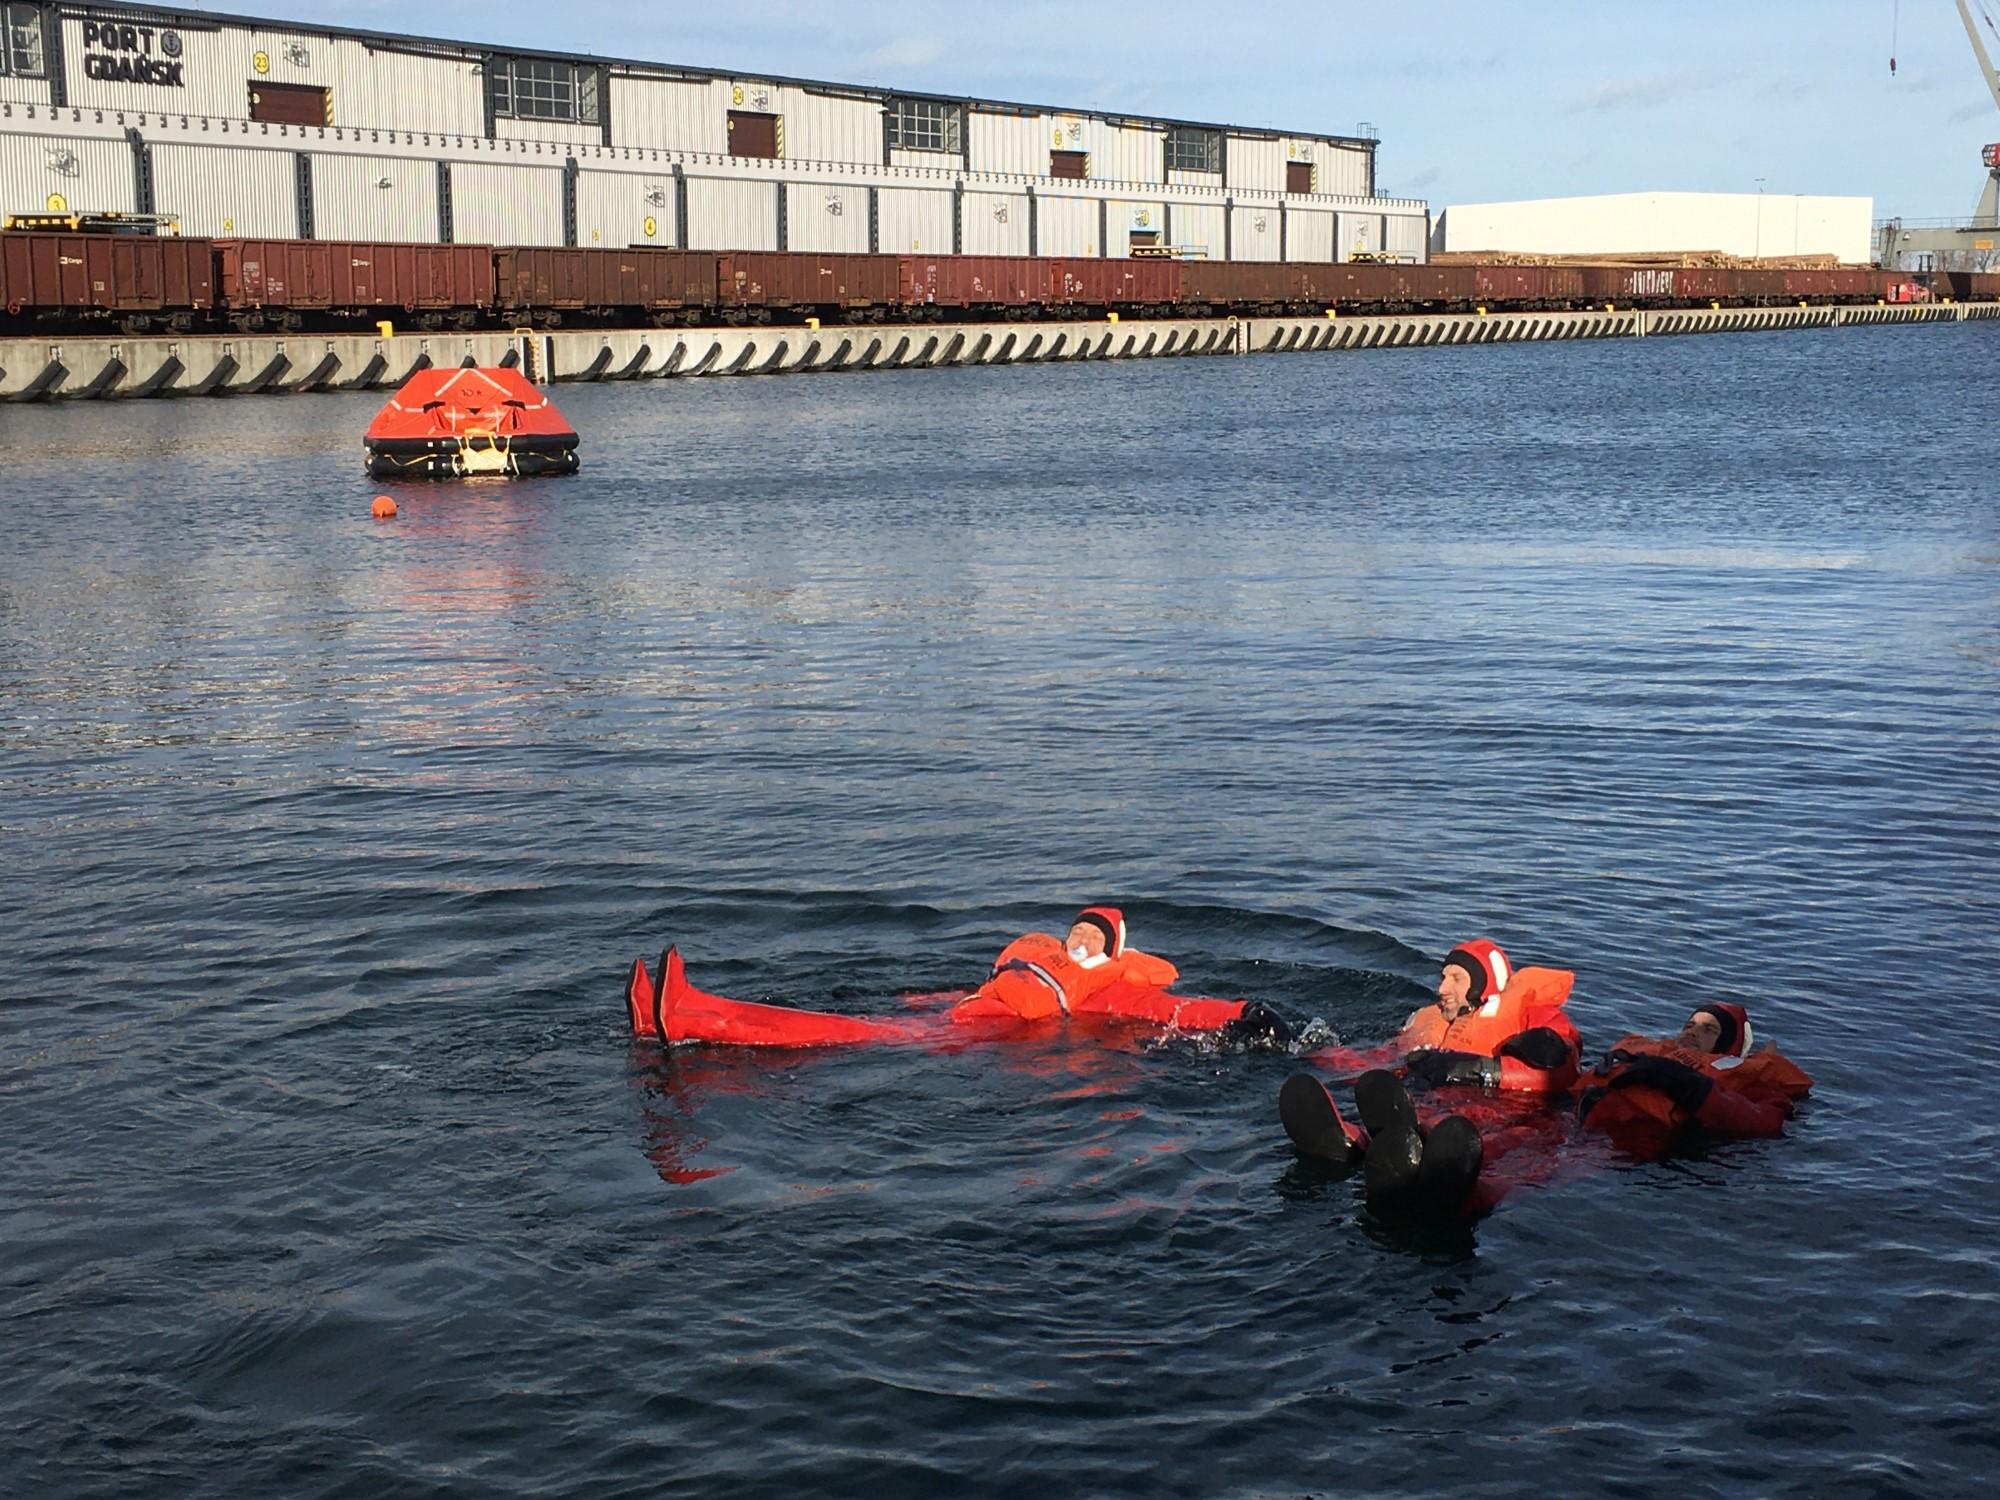 www.goropes.com gwo bst sea survival offshore platforma osrodek szkoleniowy gdańsk gdynia sopot